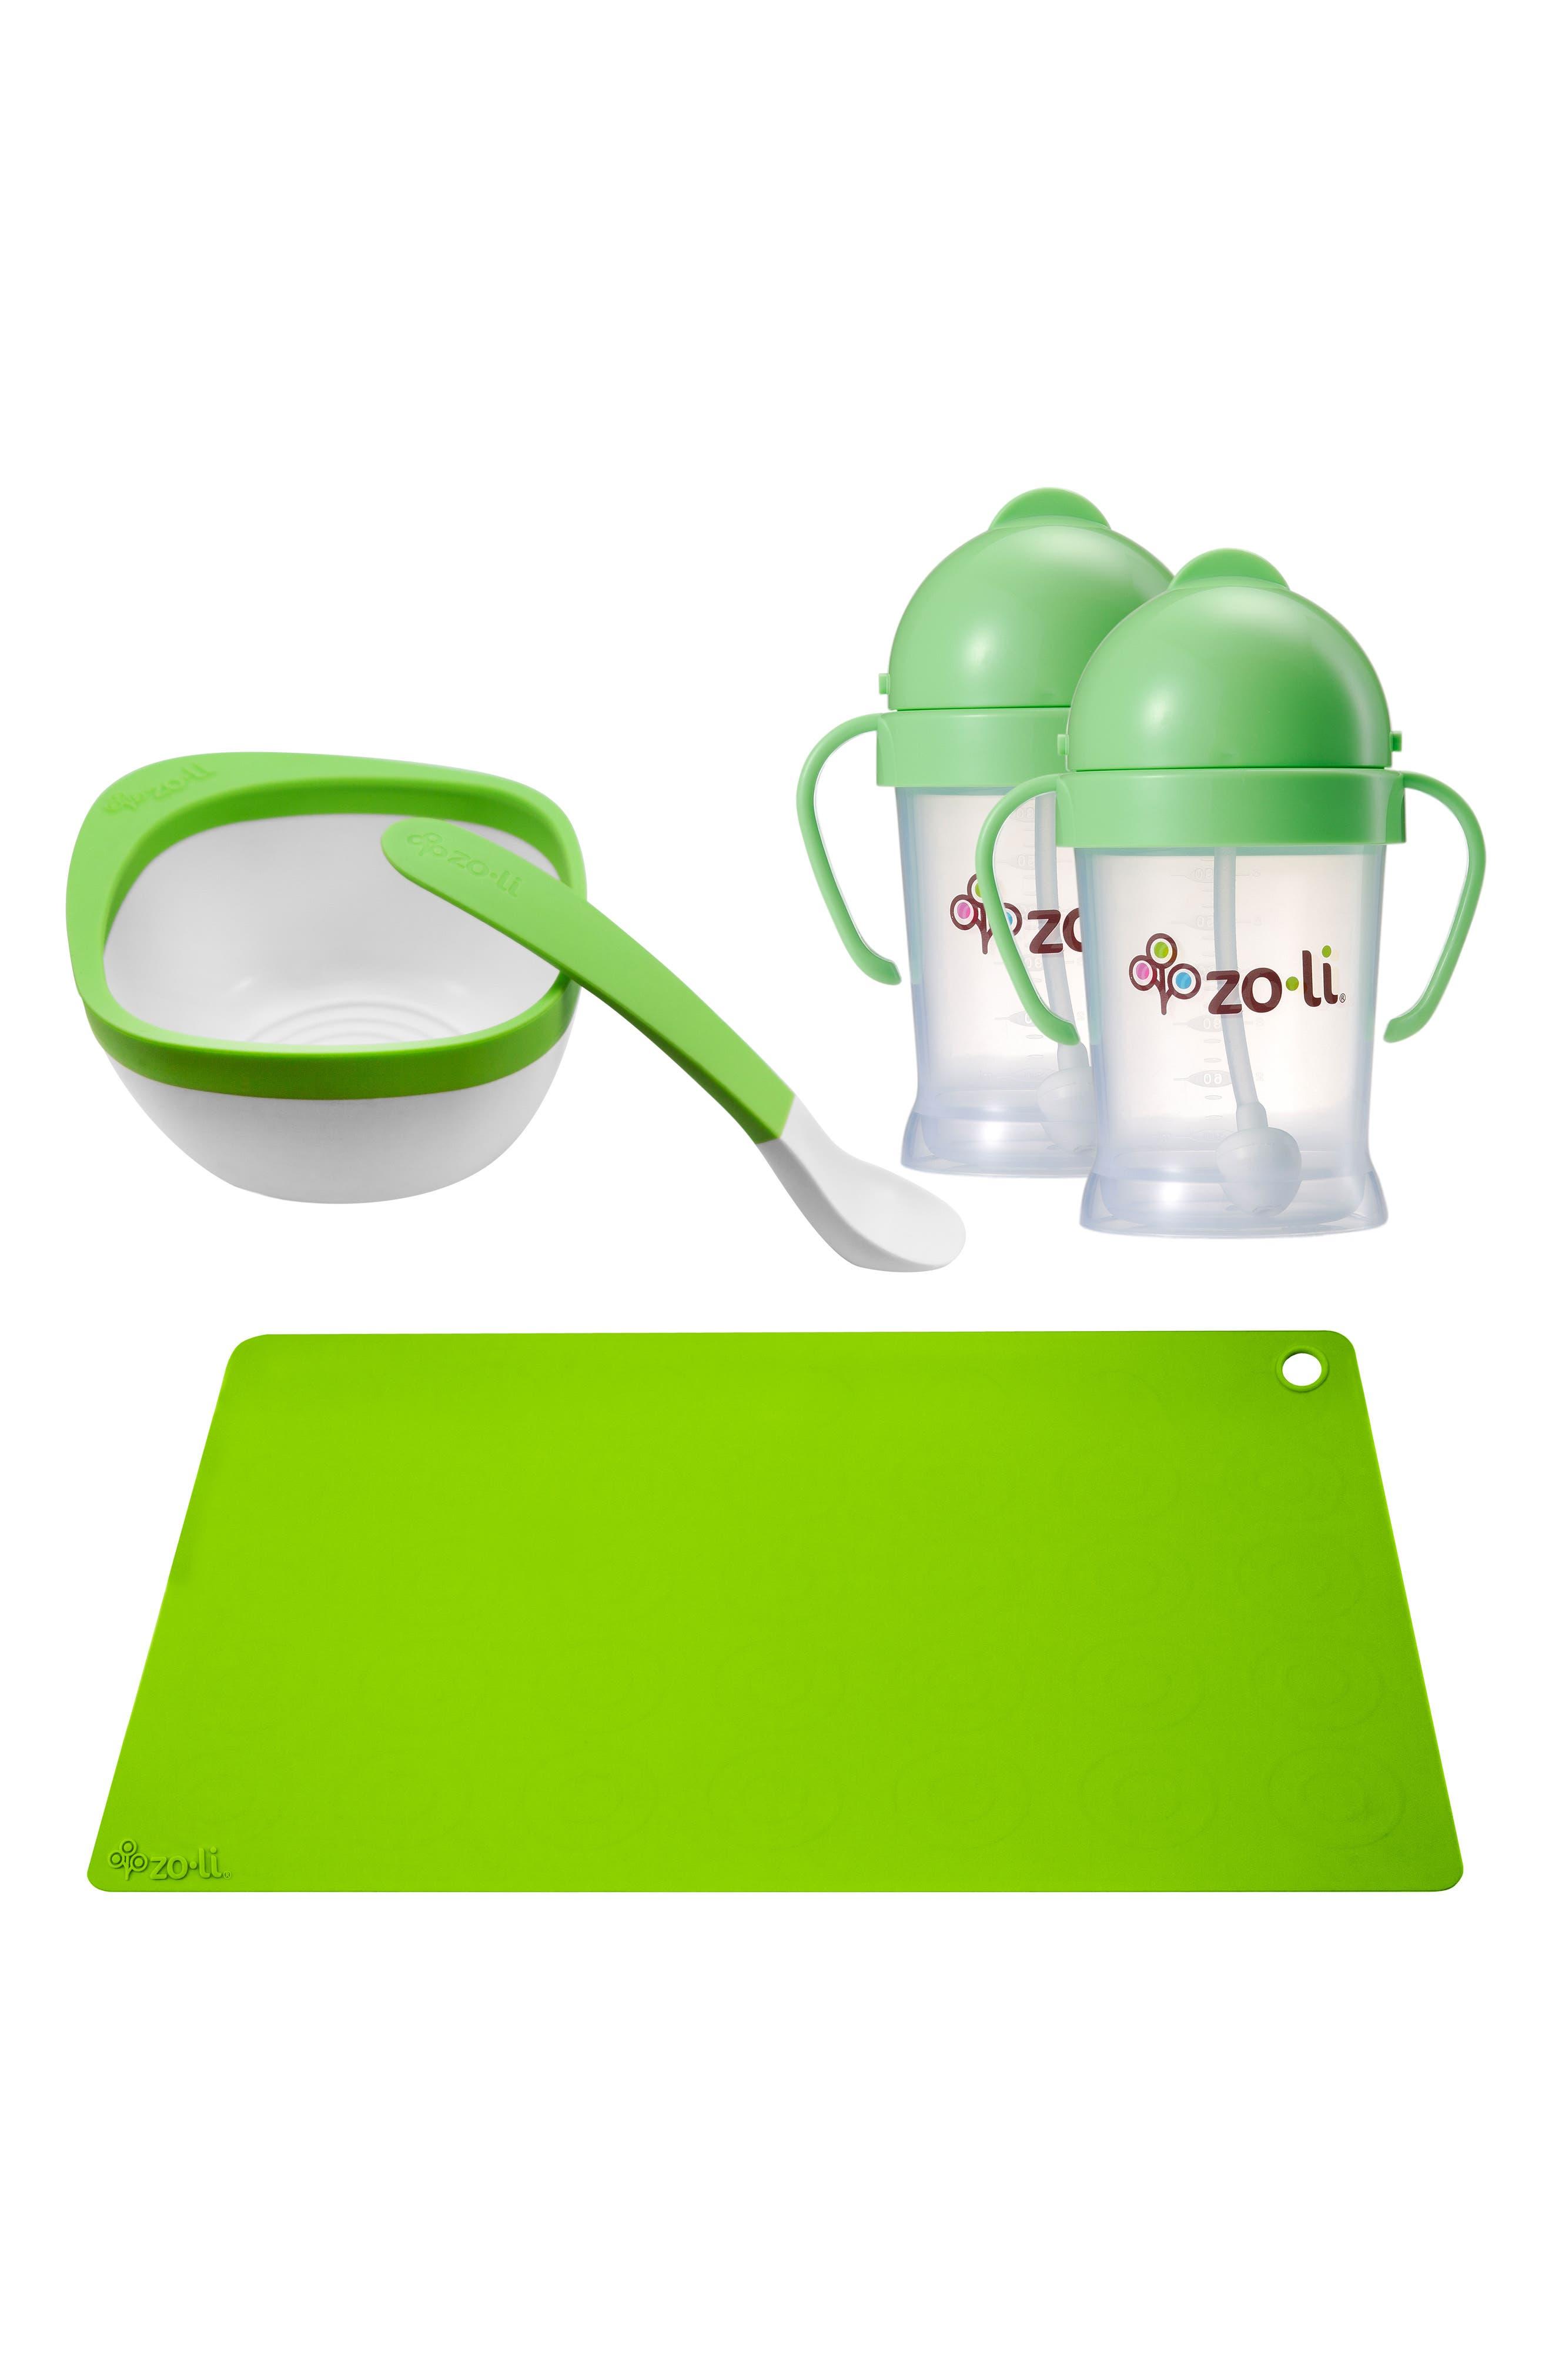 Toddler Mealtime 5-Piece Set,                         Main,                         color, Green